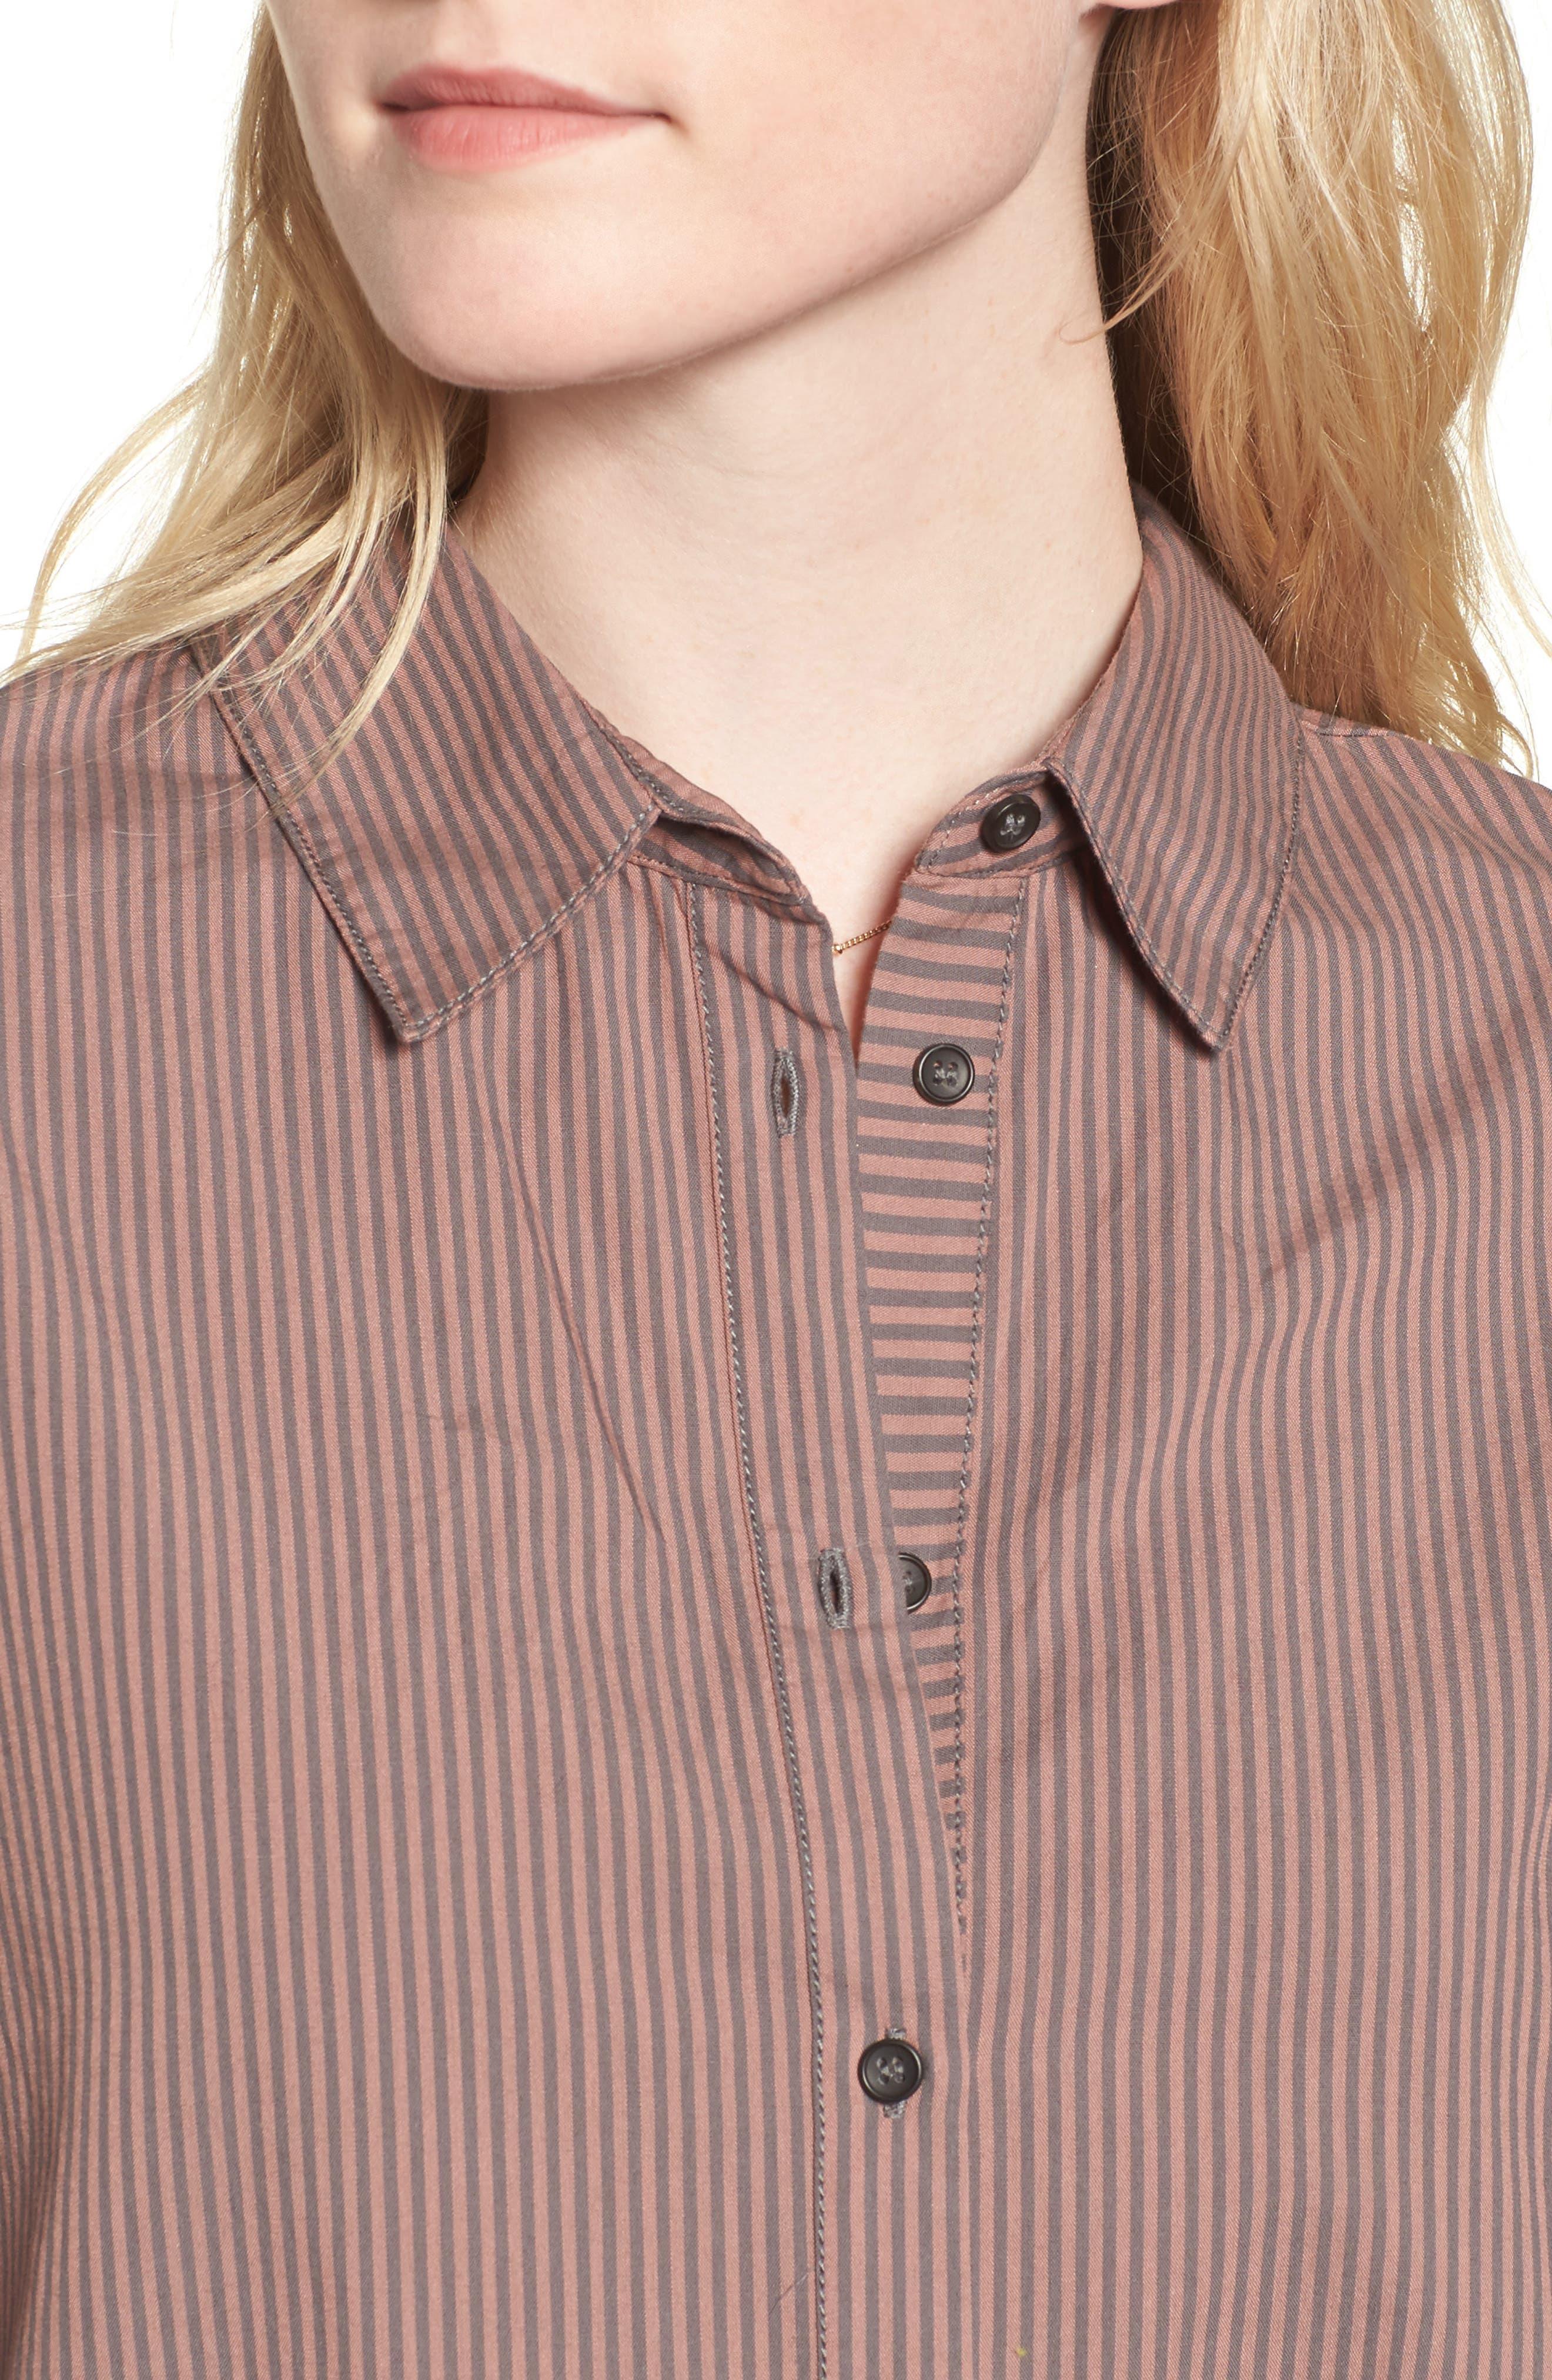 Lakehouse Oversize Shirt,                             Alternate thumbnail 4, color,                             Pink